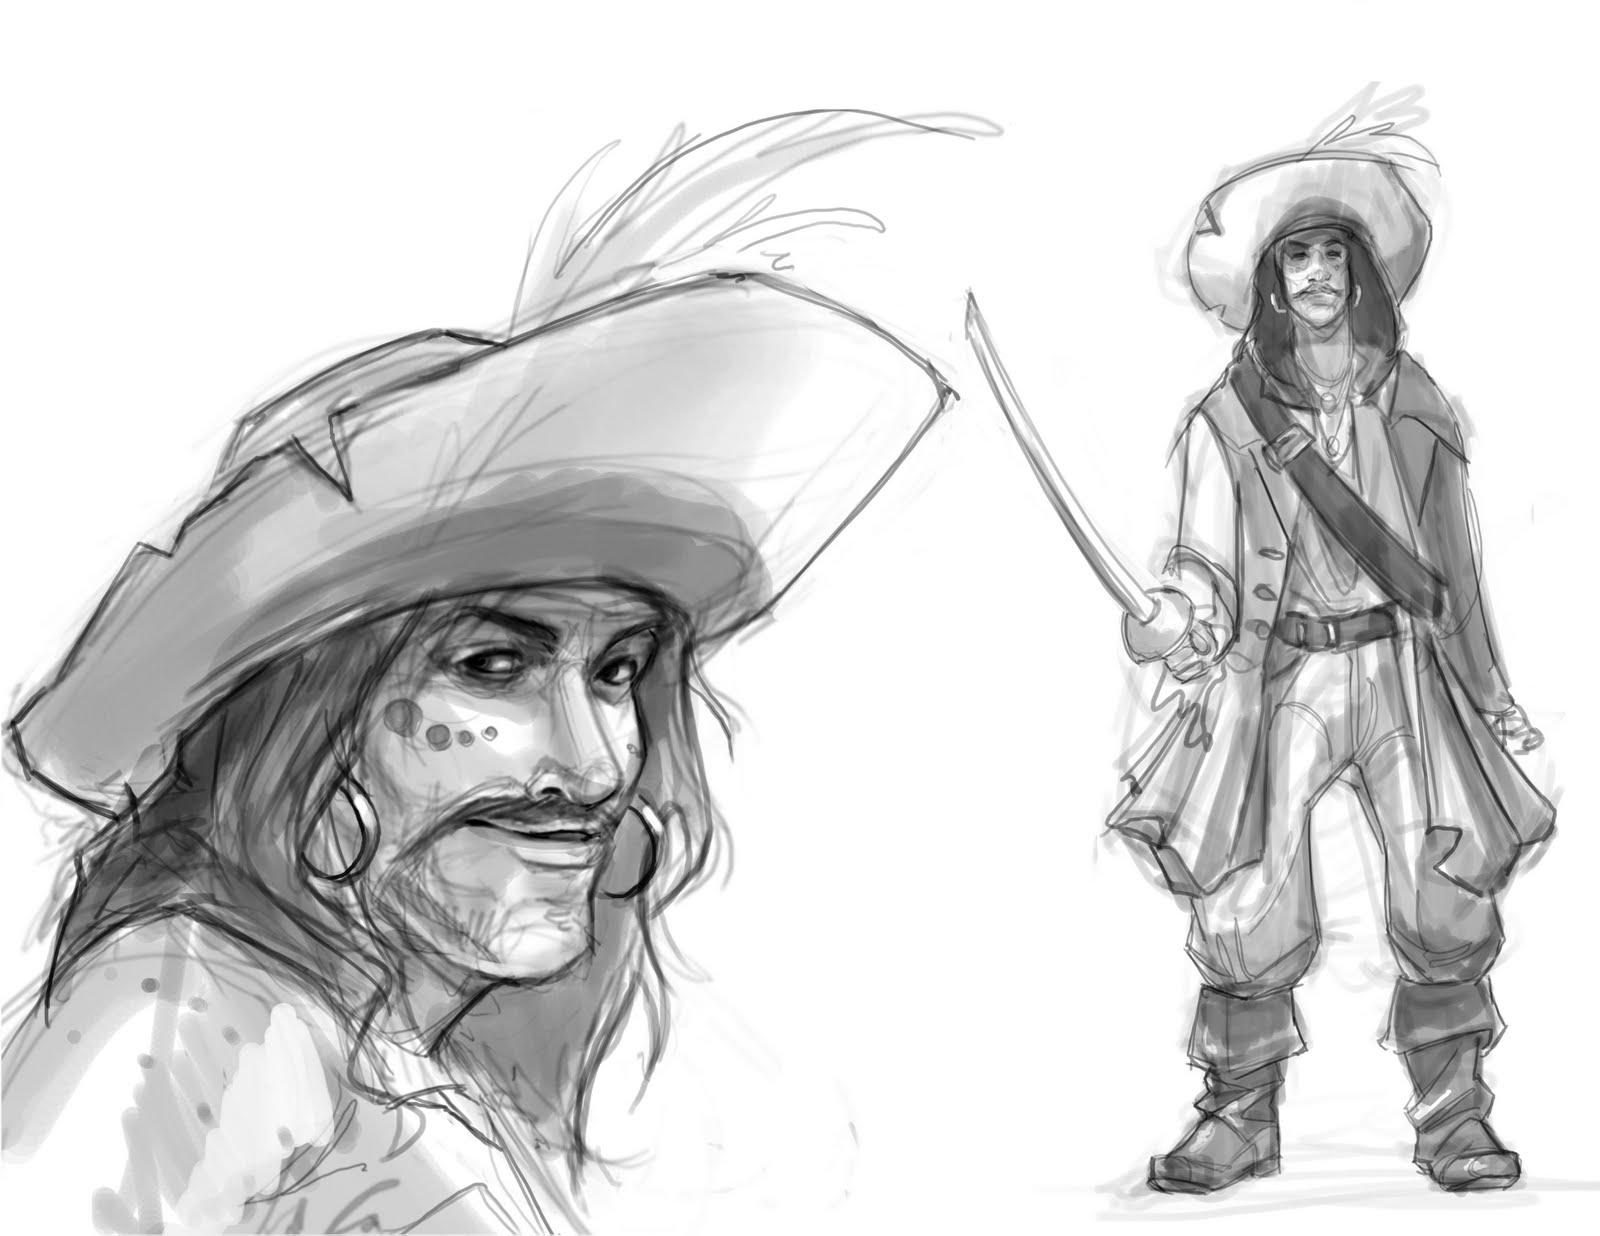 http://3.bp.blogspot.com/_CRbYoyB3j44/S8ivHvmSnbI/AAAAAAAAANM/saEJgGzjF80/s1600/pirate.jpg